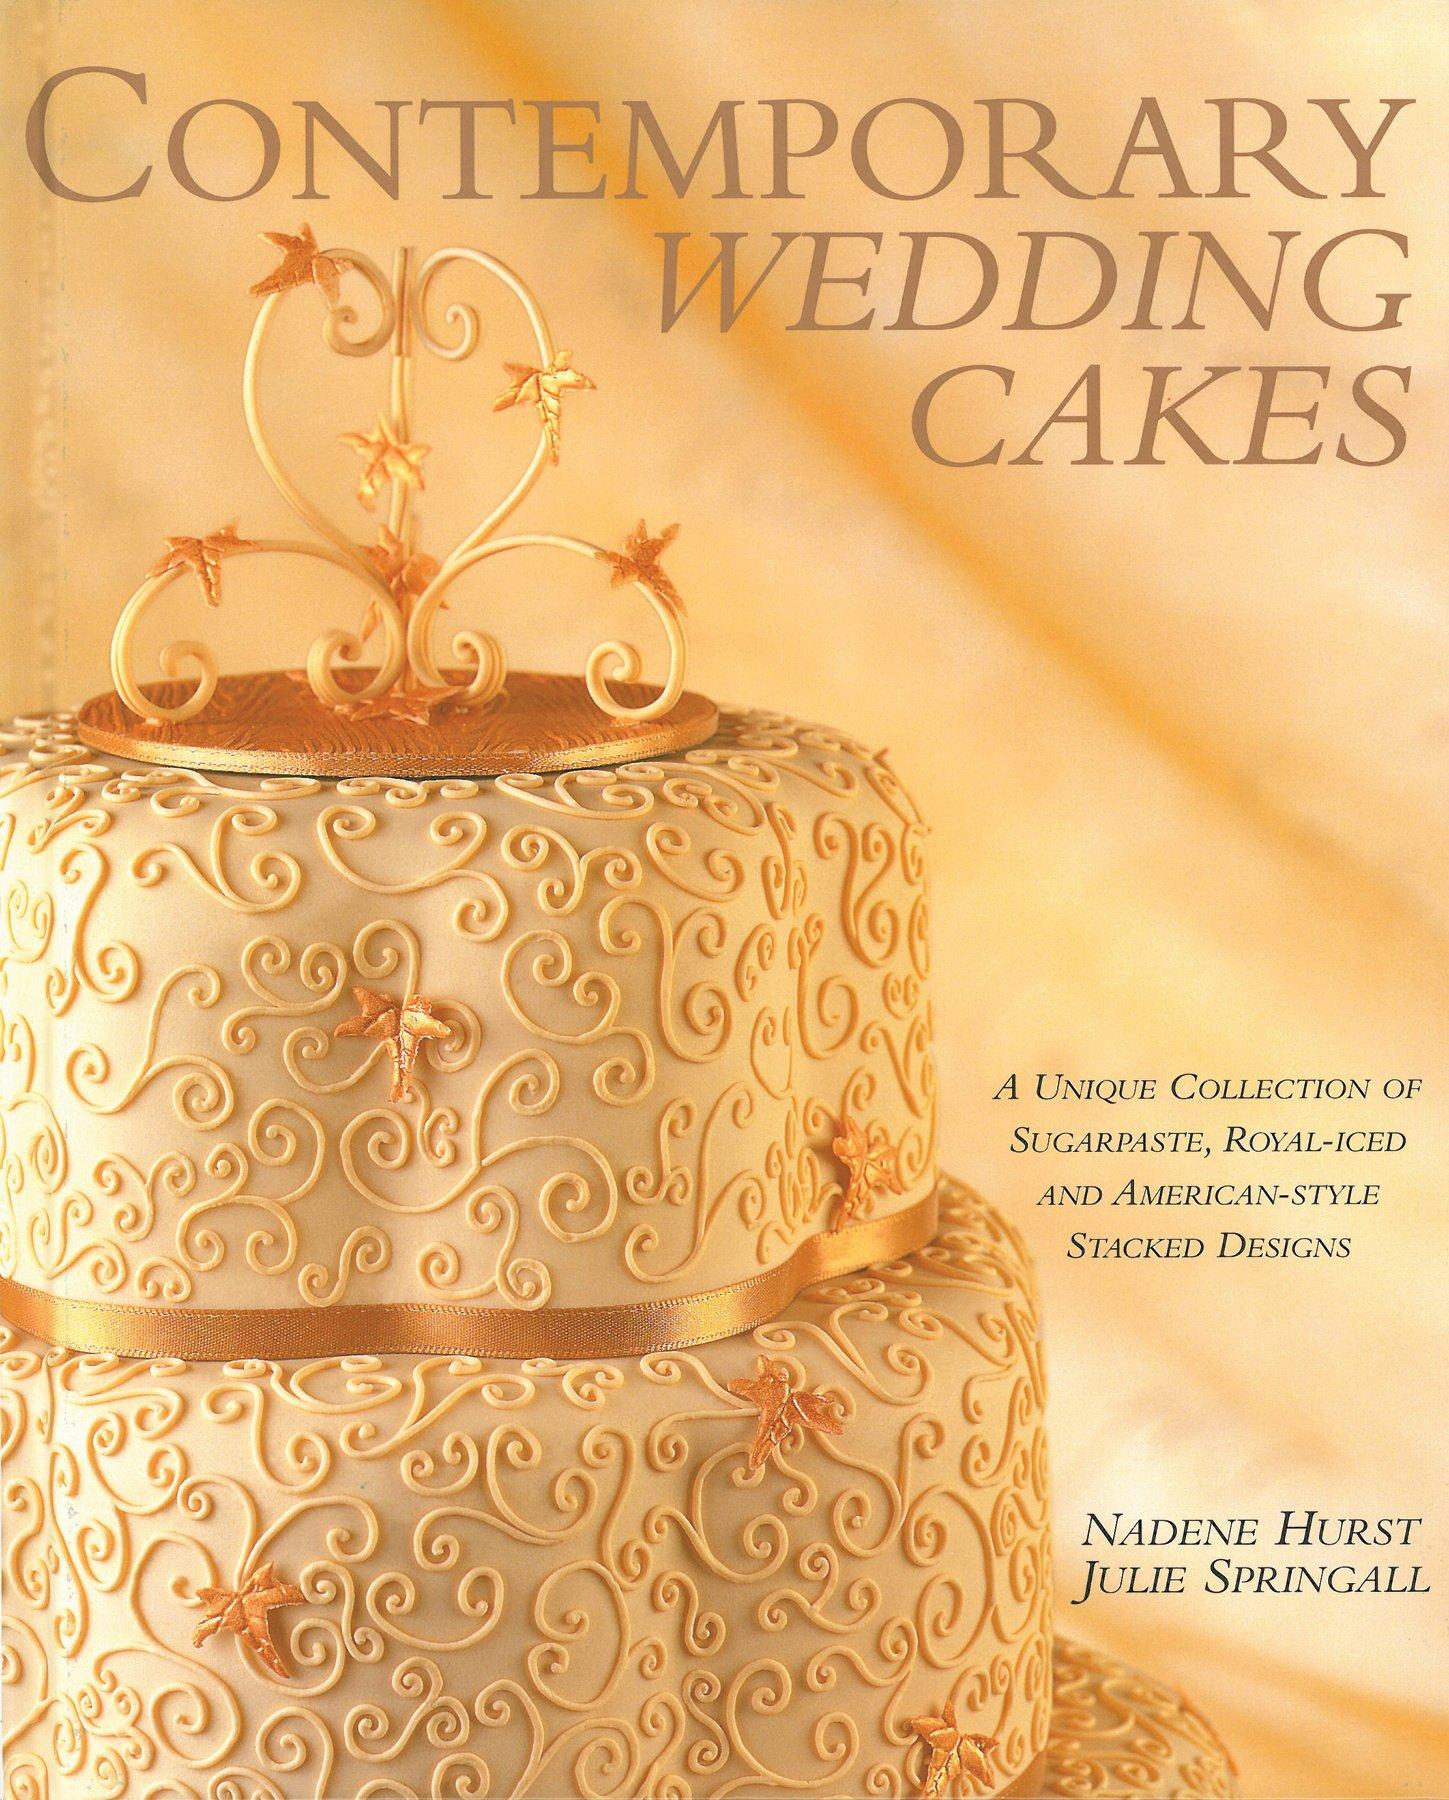 Contemporary Wedding Cakes: A Unique Collection of Sugarpaste, Royal ...